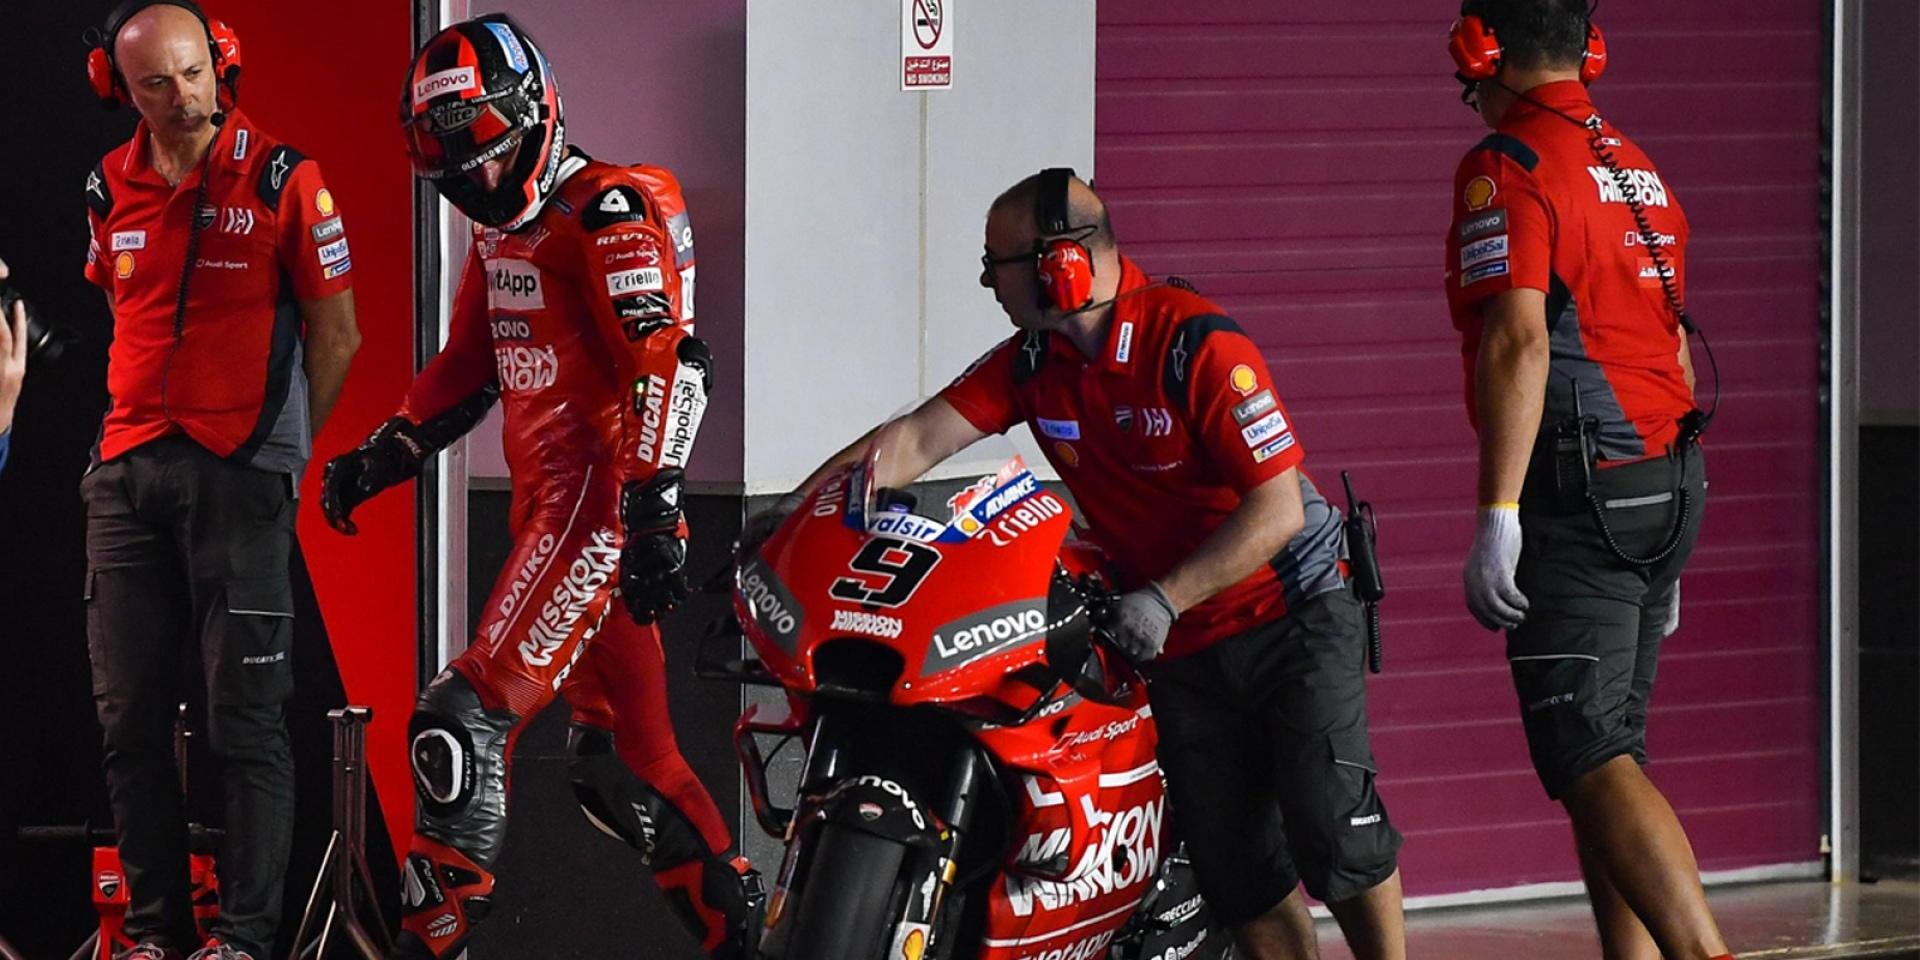 DUCATI車手大風吹再起。謠傳Bautista有望取代PETRUCCI重返MotoGP?